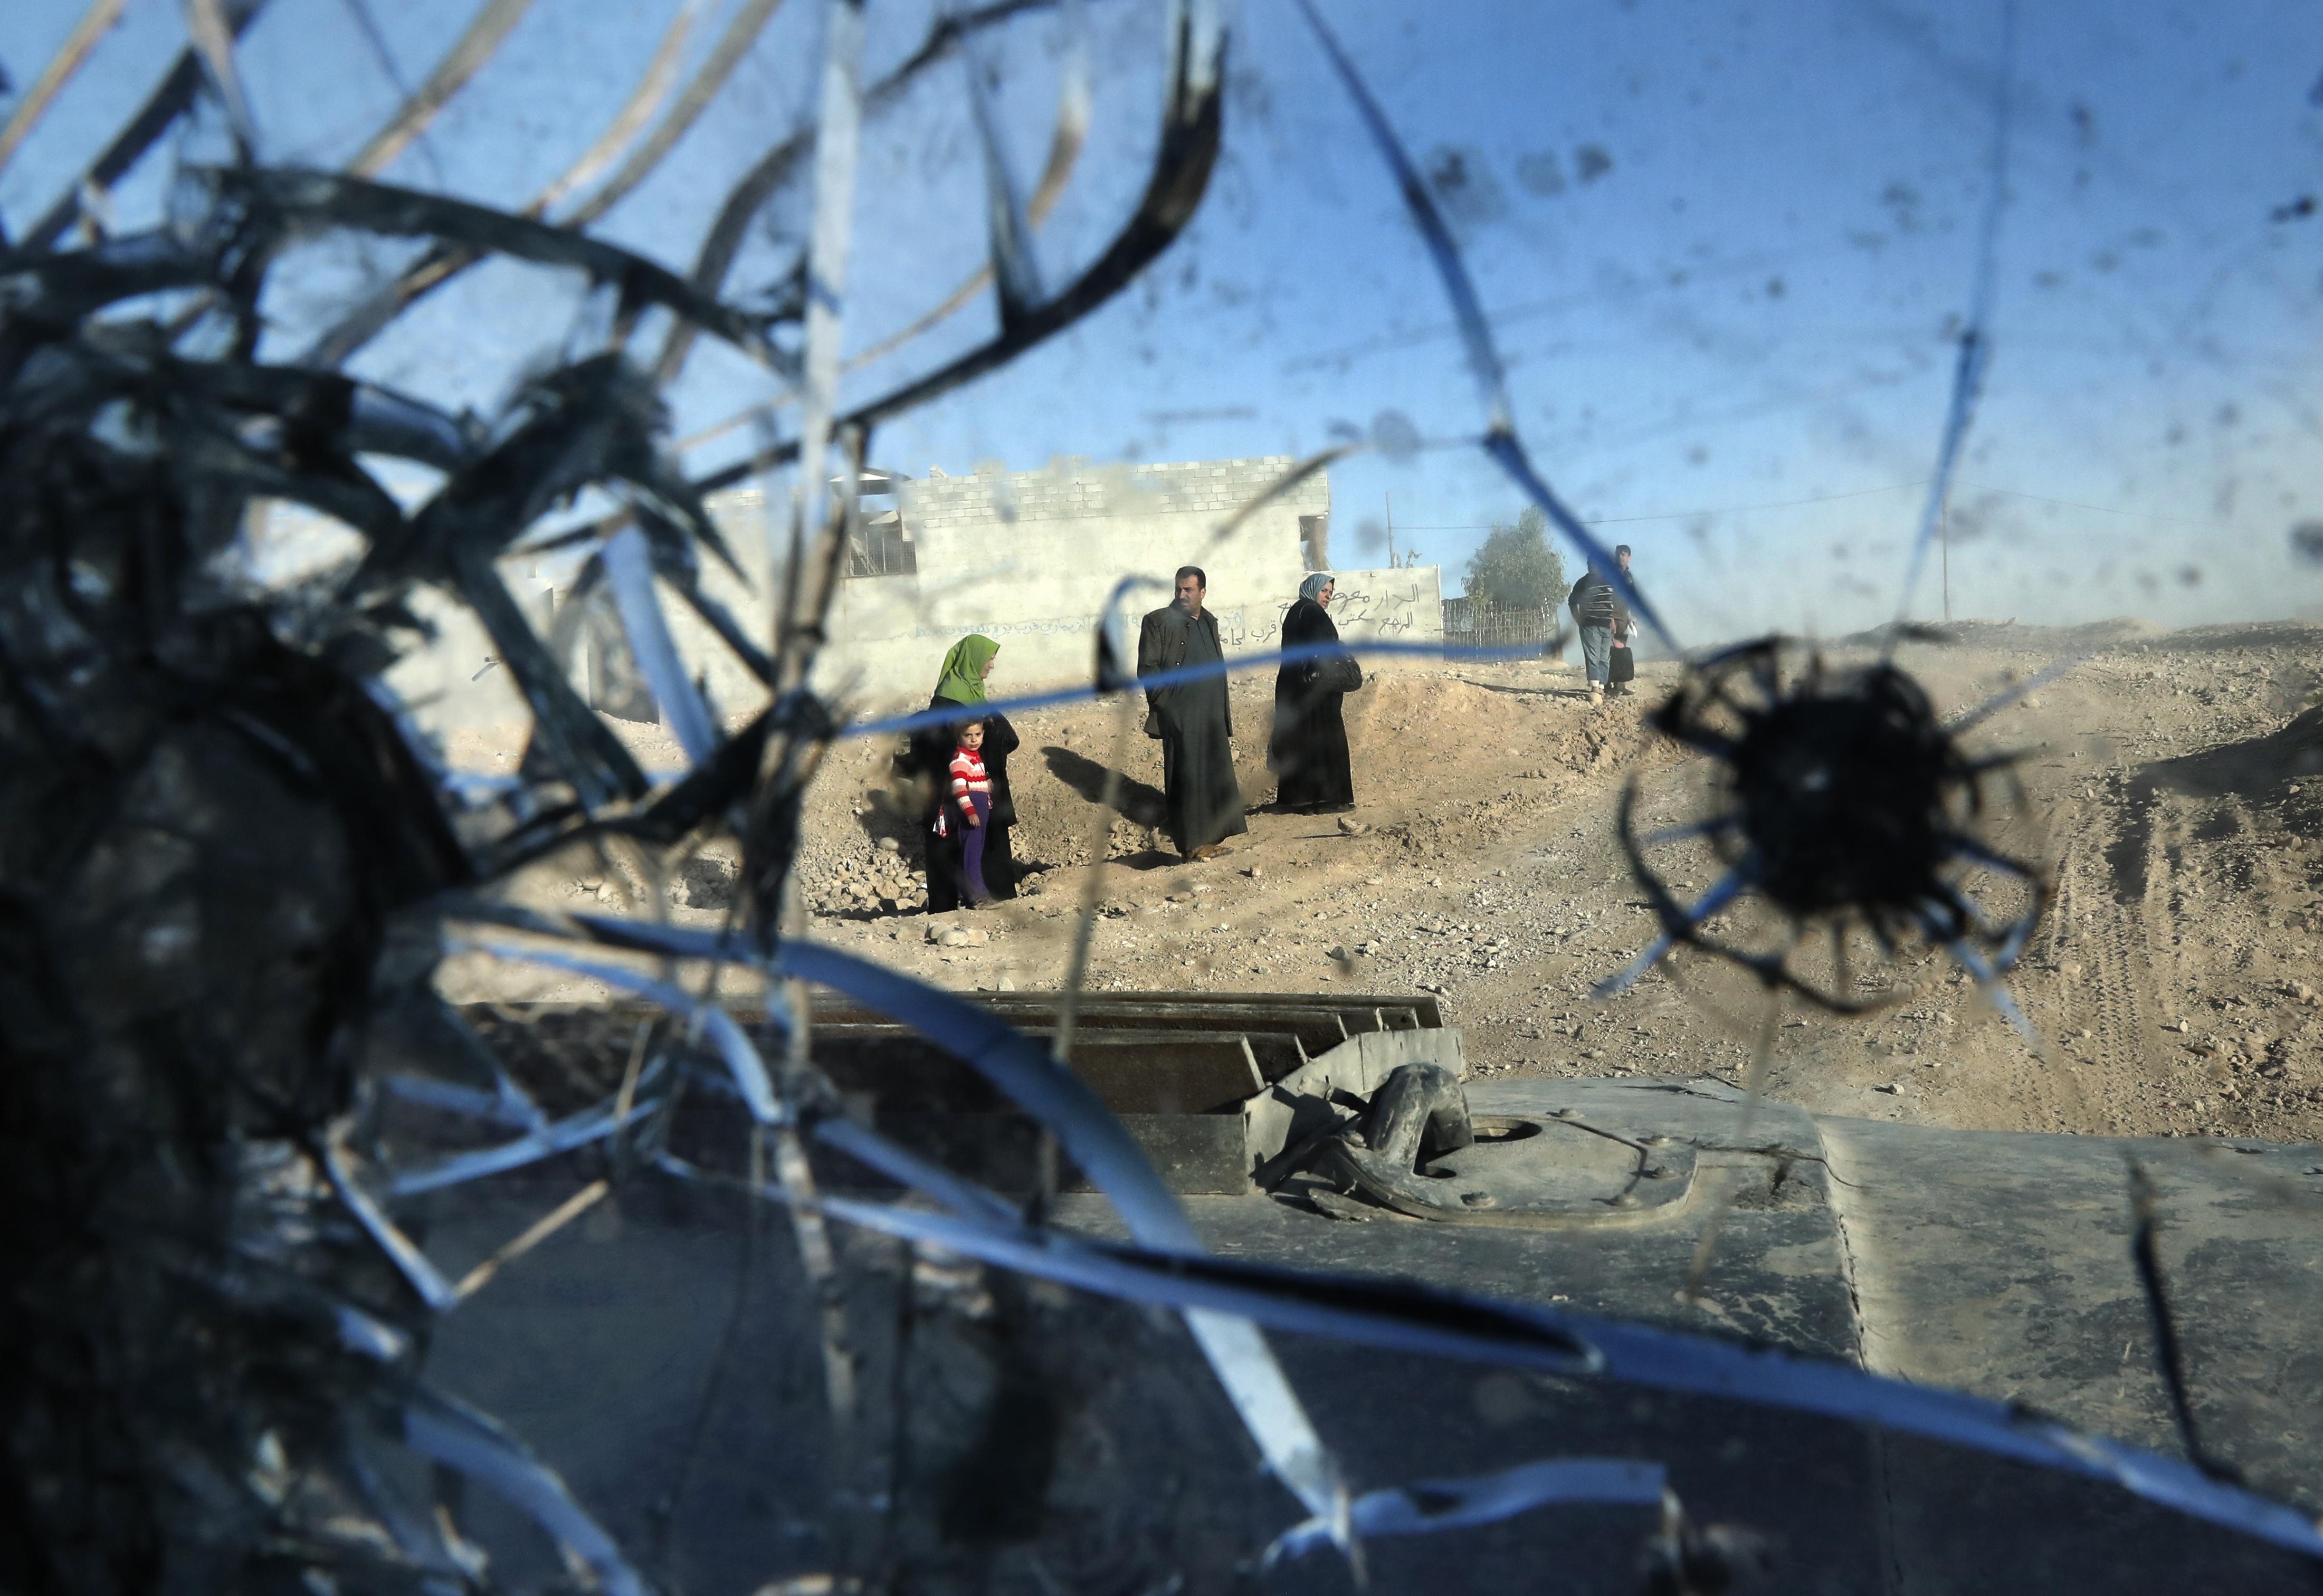 Bounty will hasten al-Baghdadi's demise: officials